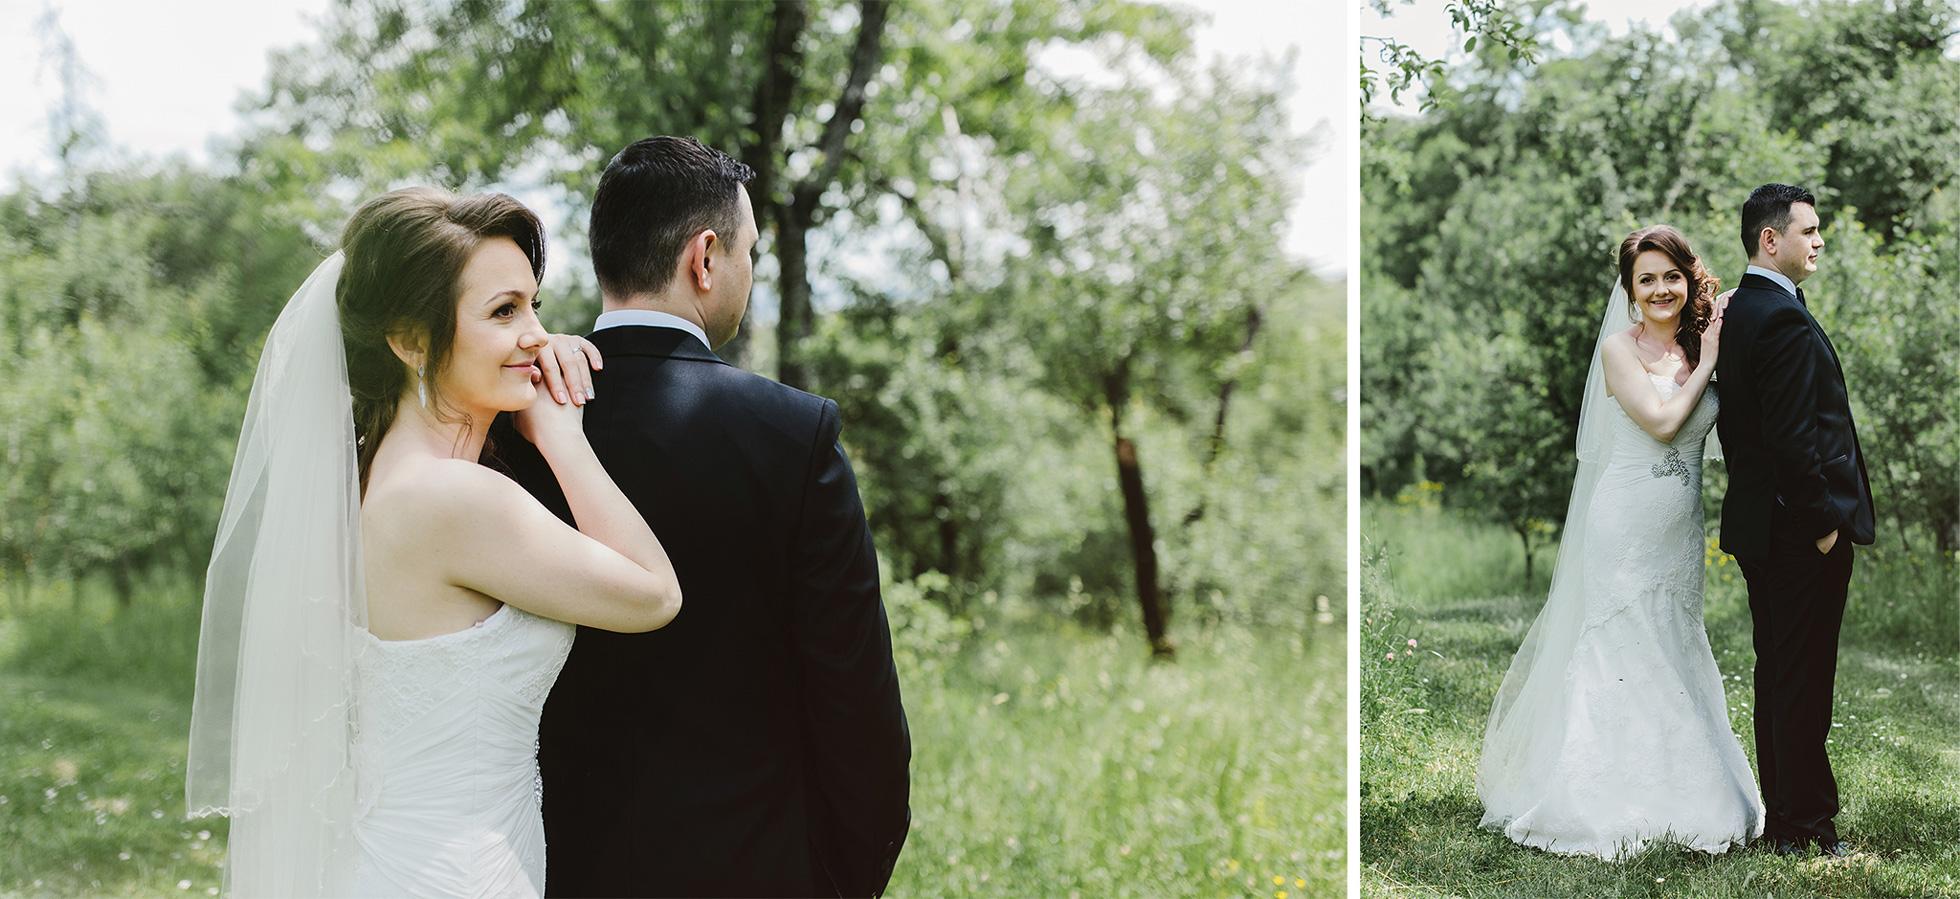 Liana-+-Florin-{wedding}-101